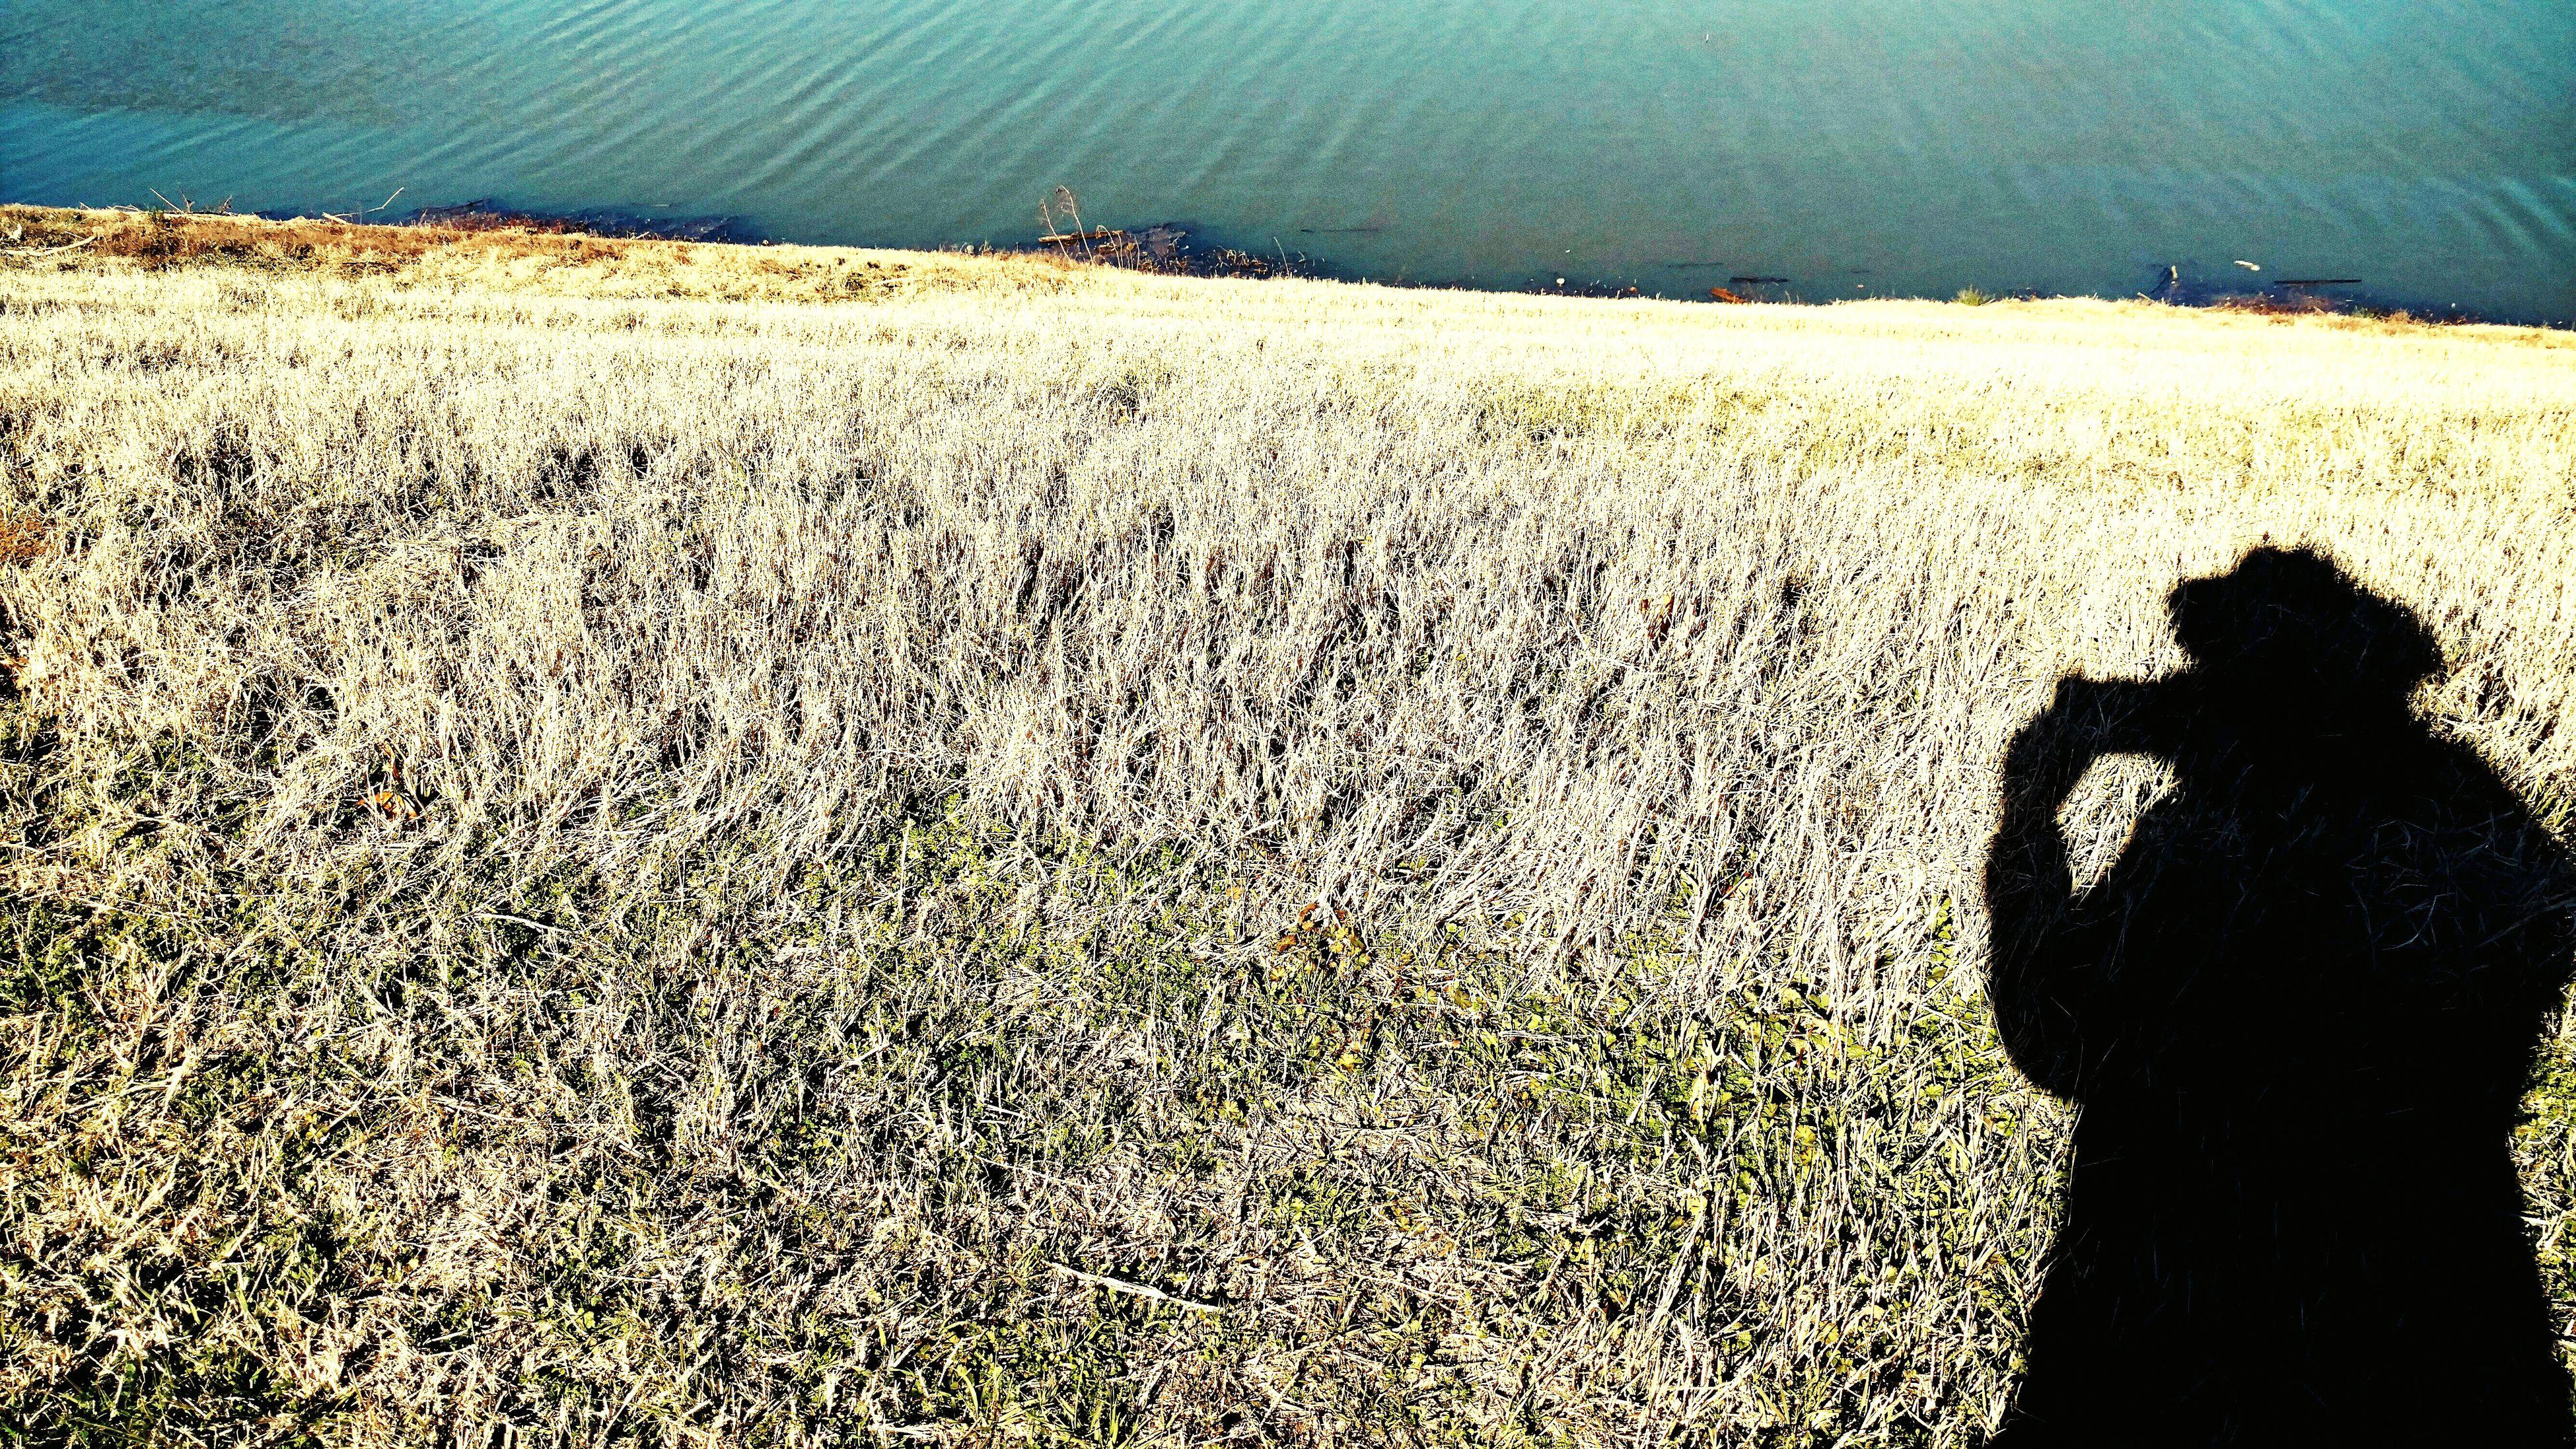 Vincentmoment Sunlight Strawinthesun Full Frame Captured Moment Lonephotographer